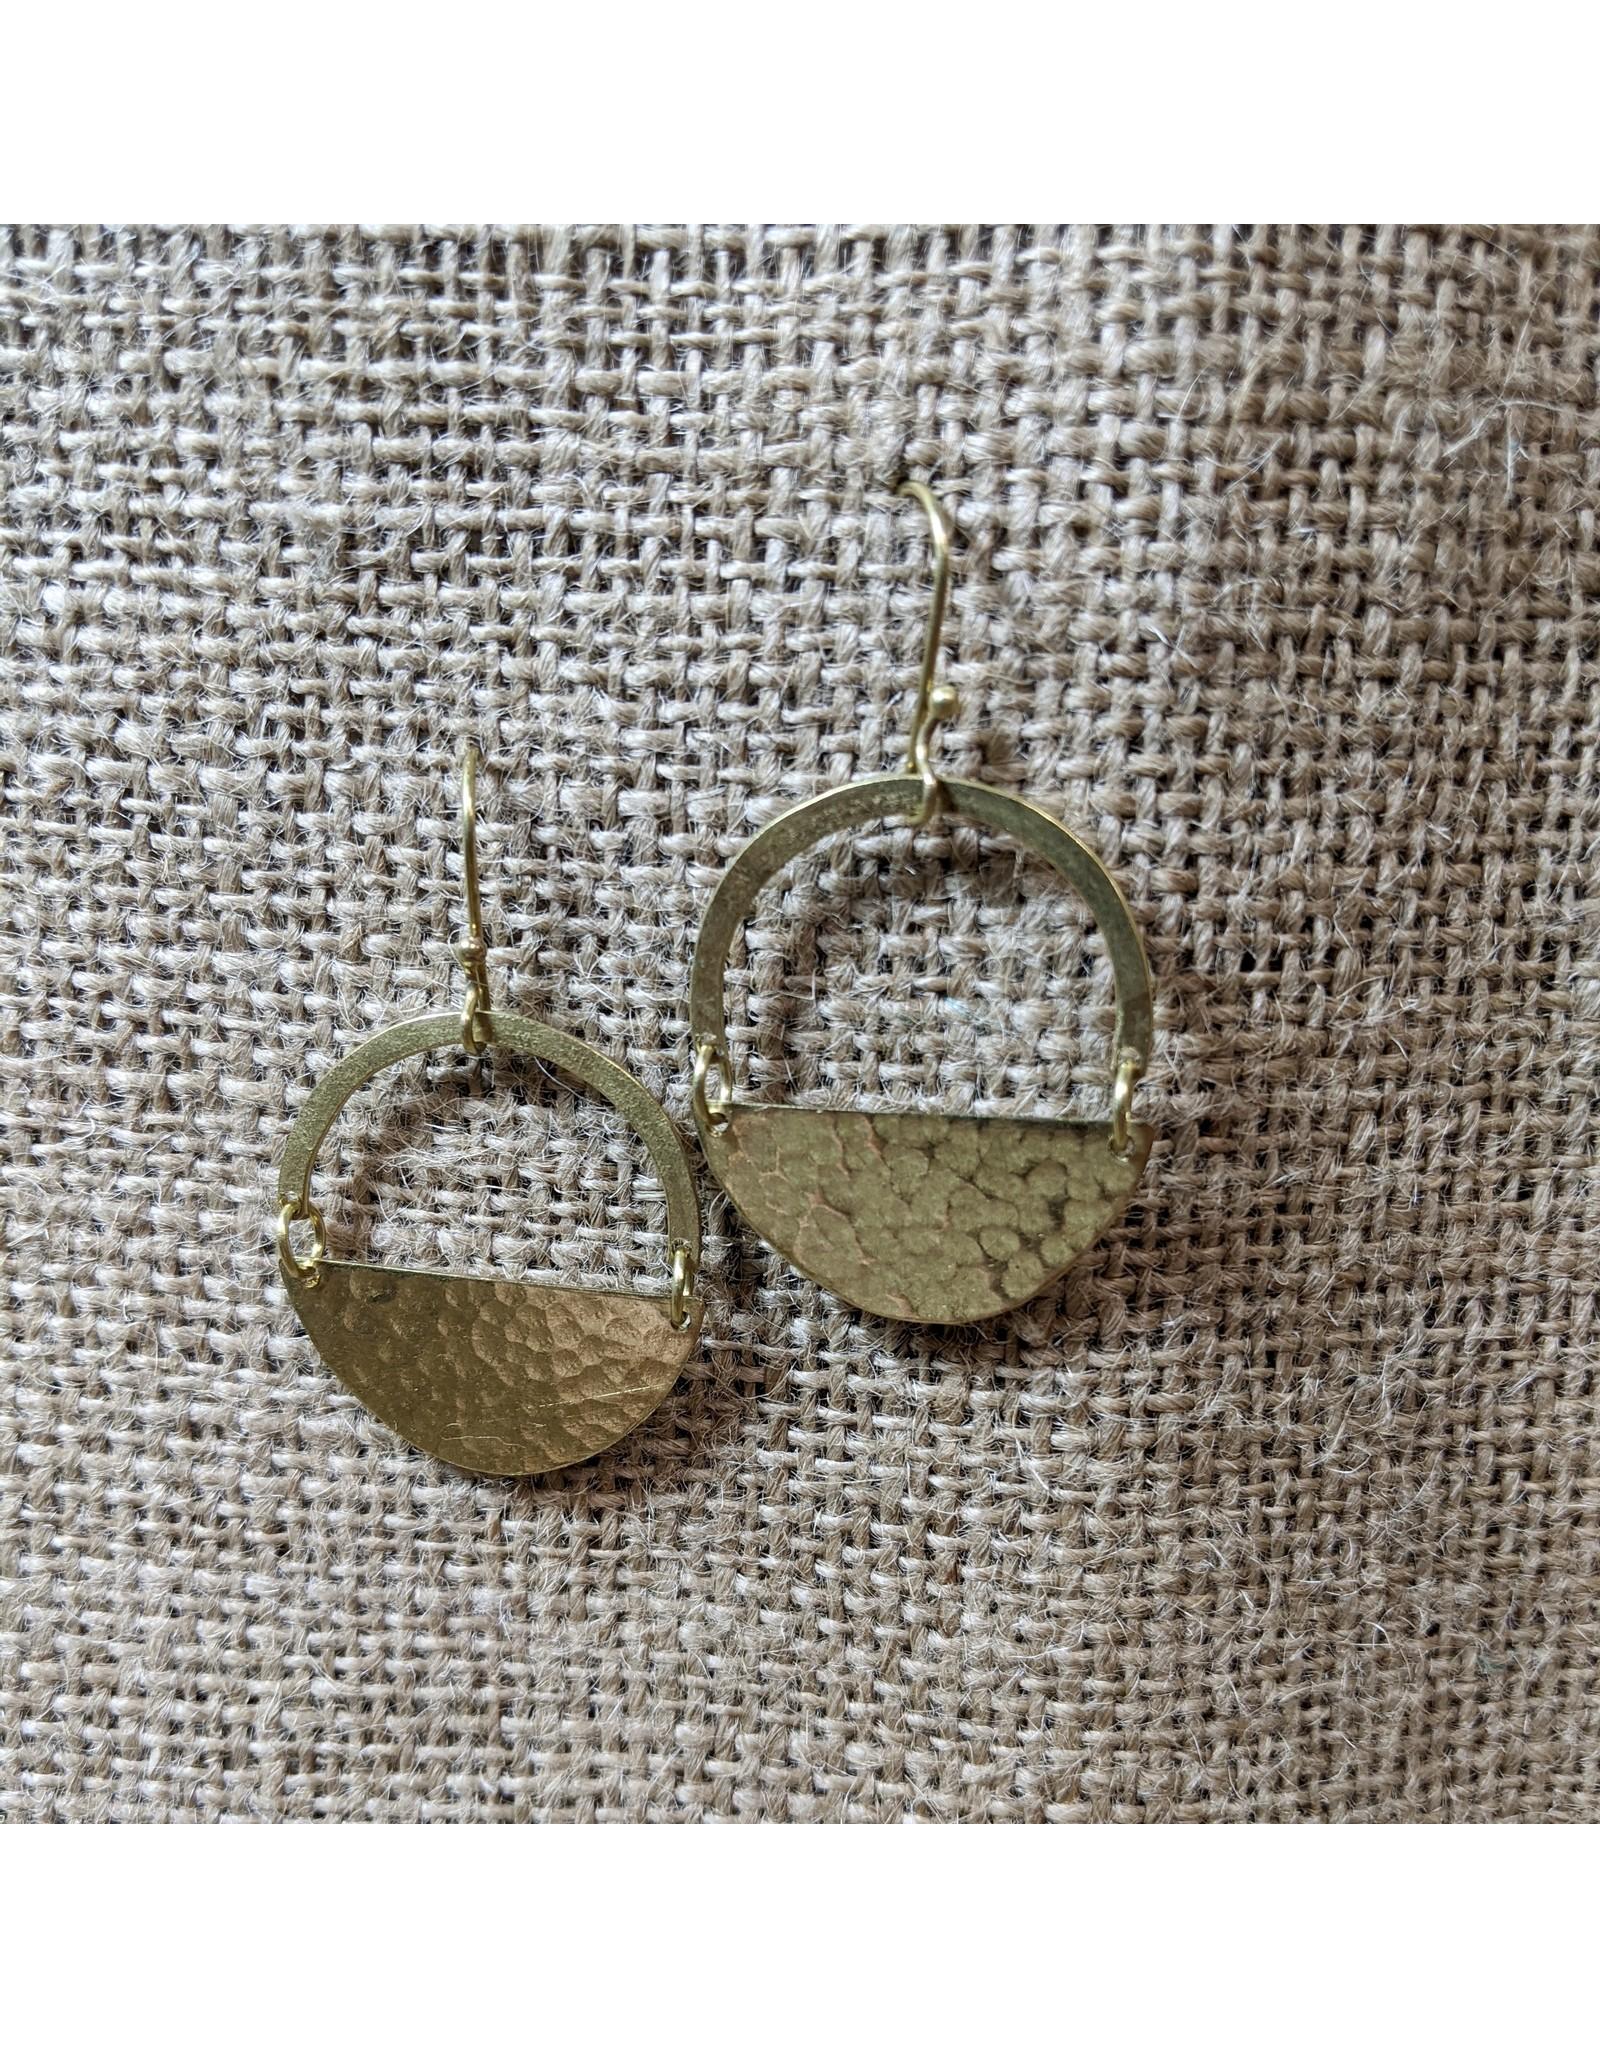 Ten Thousand Villages Half Moon Brass Earrings, India